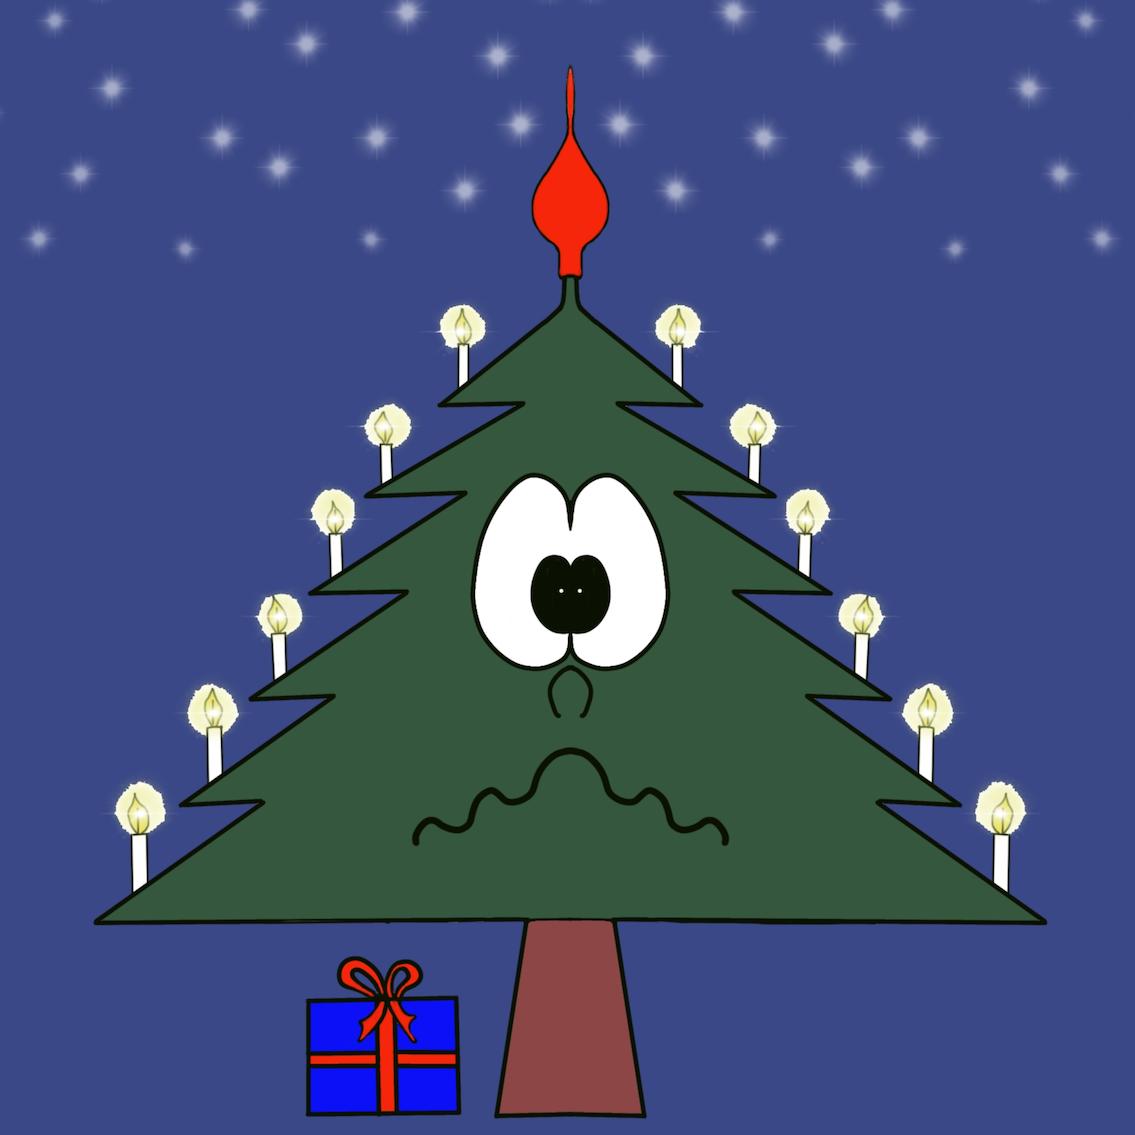 Christmas Tree Emotion sticker messages sticker-8